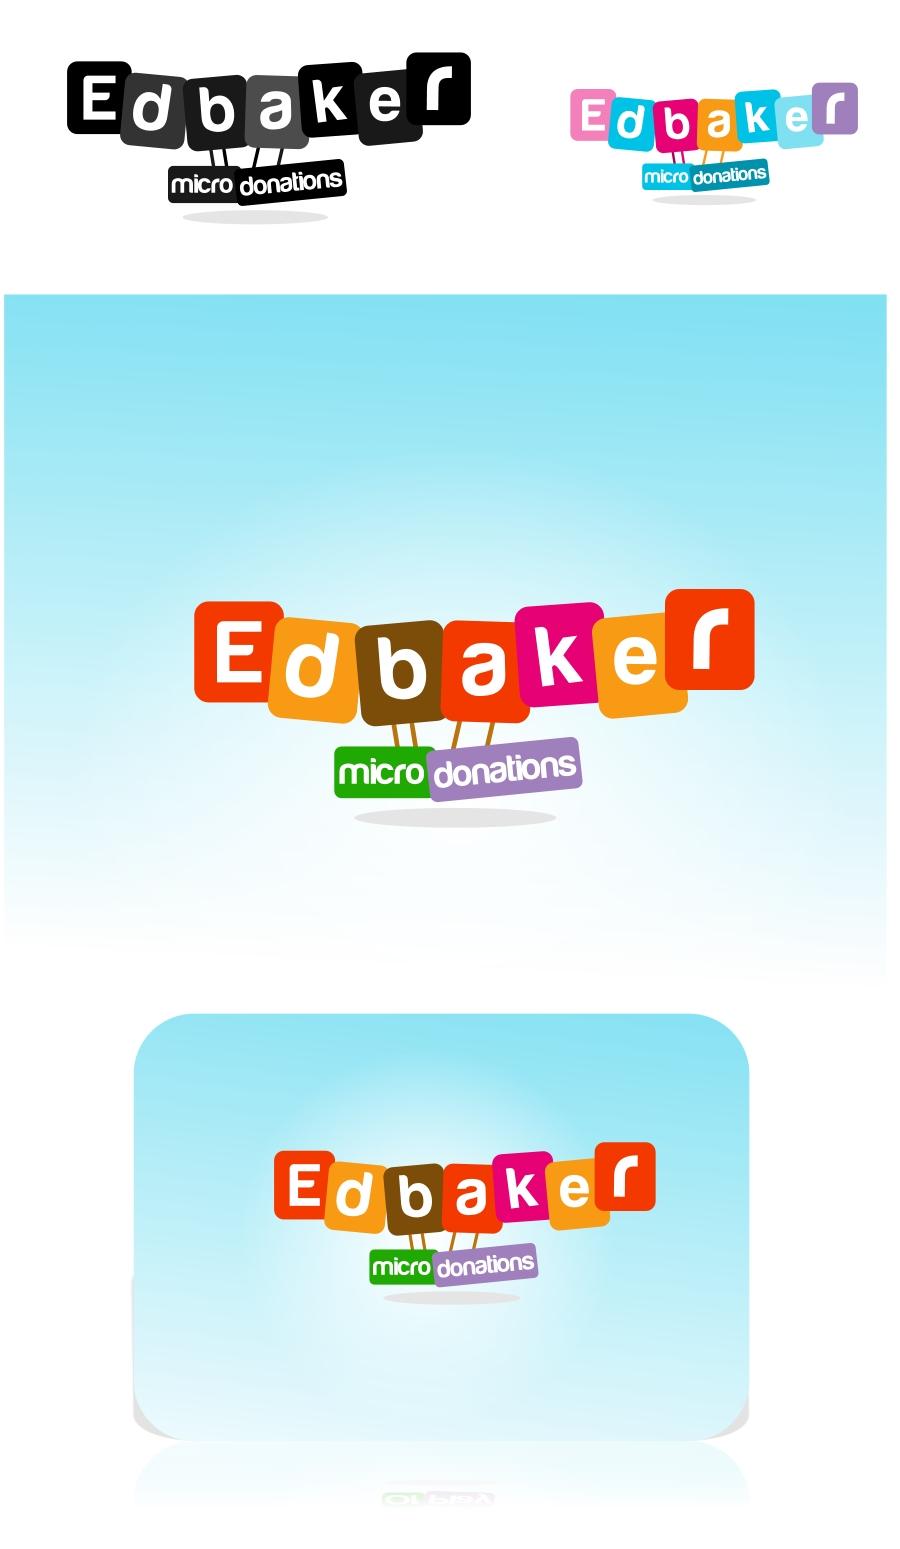 Logo Design by Private User - Entry No. 20 in the Logo Design Contest New Logo Design for edbacker.